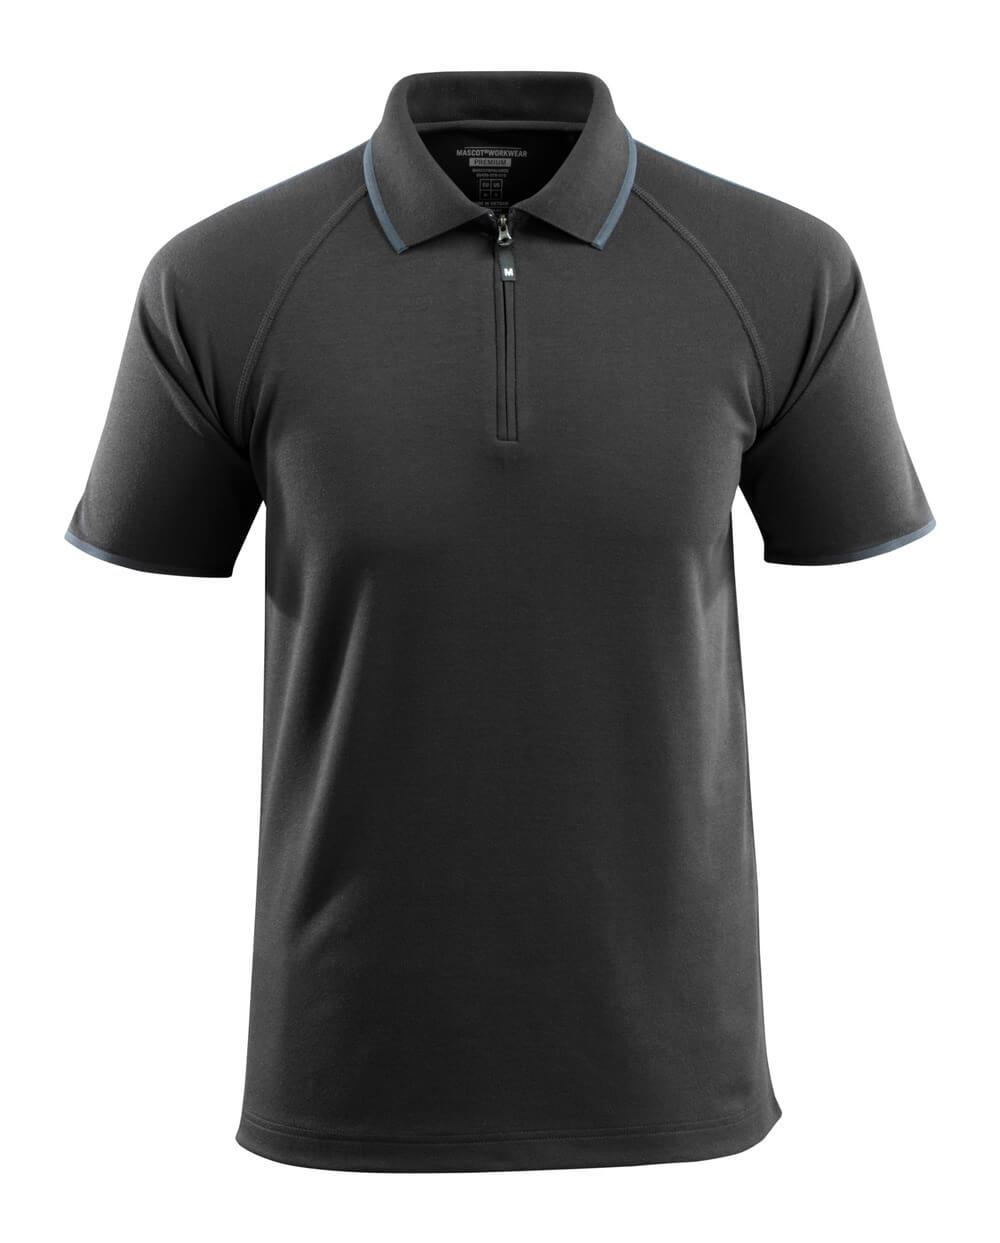 50458-978-09 Koszulka Polo - czerń